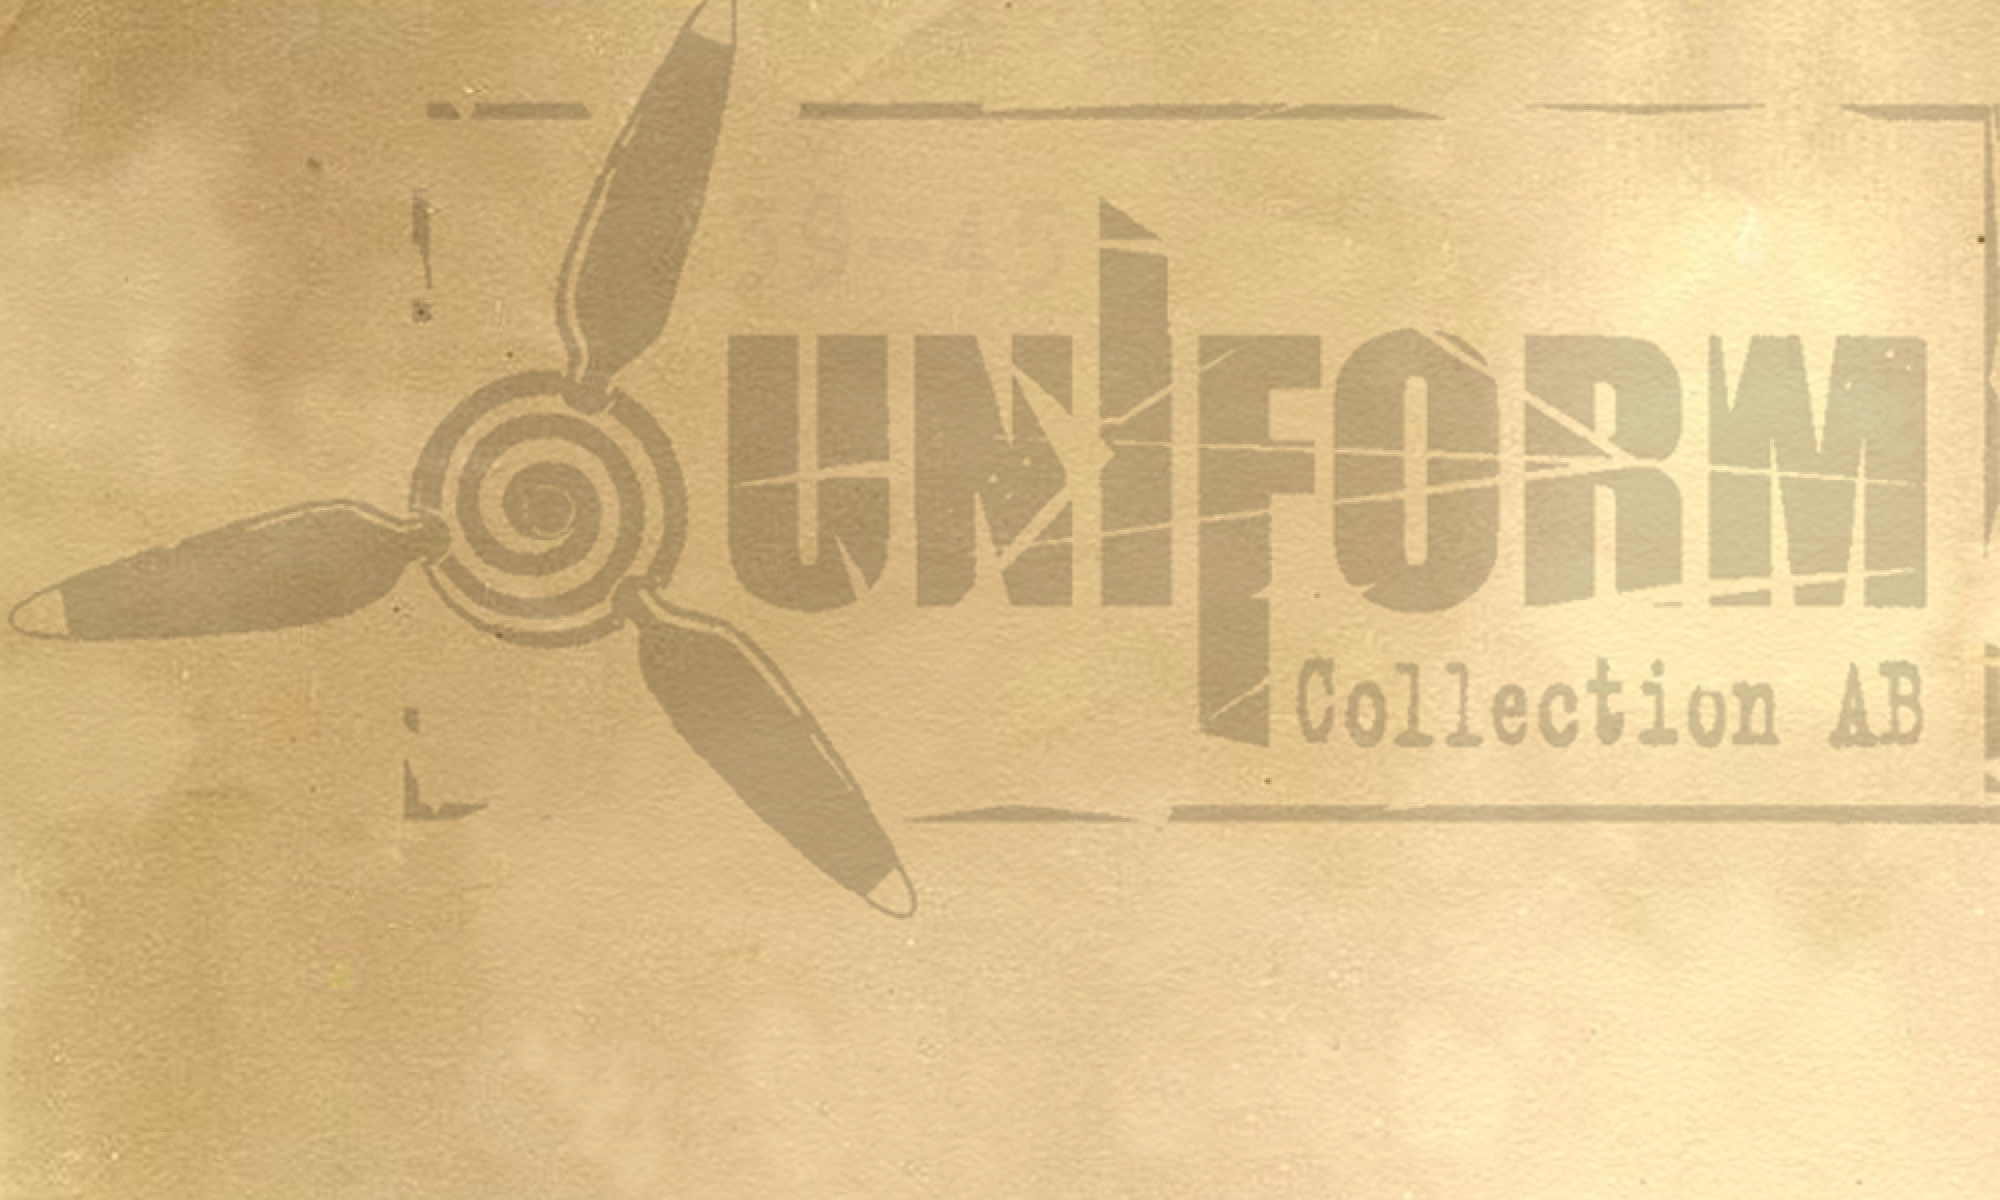 Uniform Collection AB